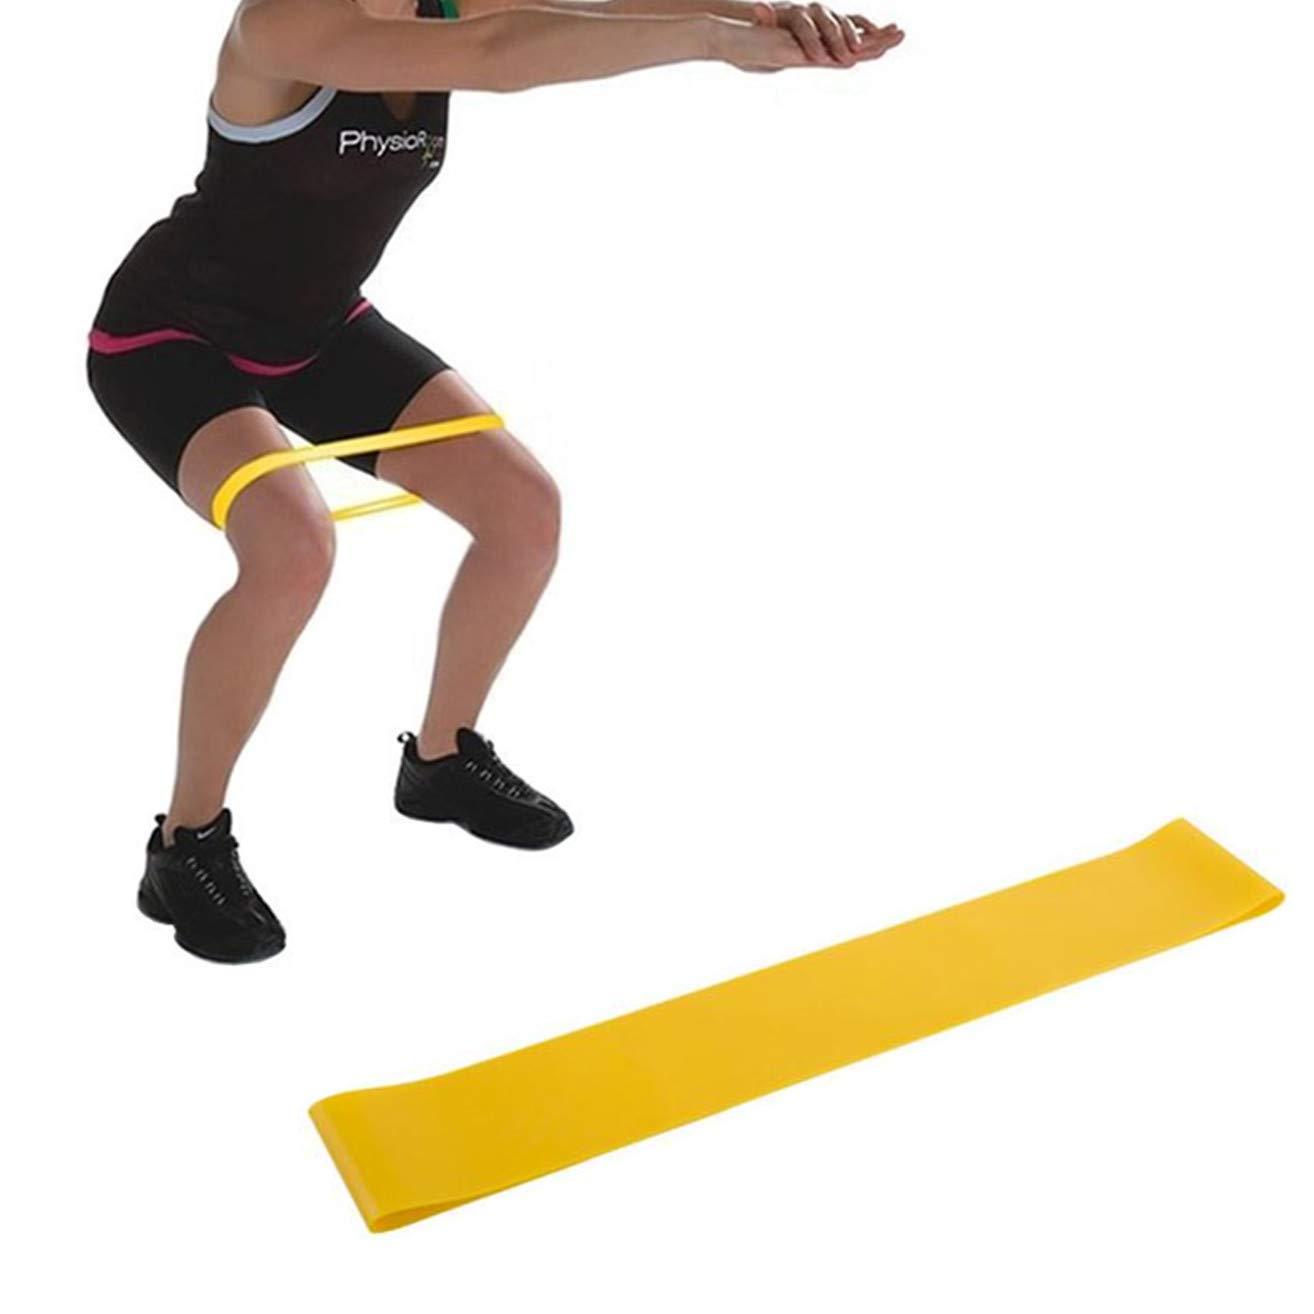 Haikingmoon Cinta Elastica Fitness - Bandas Elasticas de Fitness - Bandas Elásticas - Loop Band - Resistance Bands - Elastico Fitness - Pilates Fuerza ...